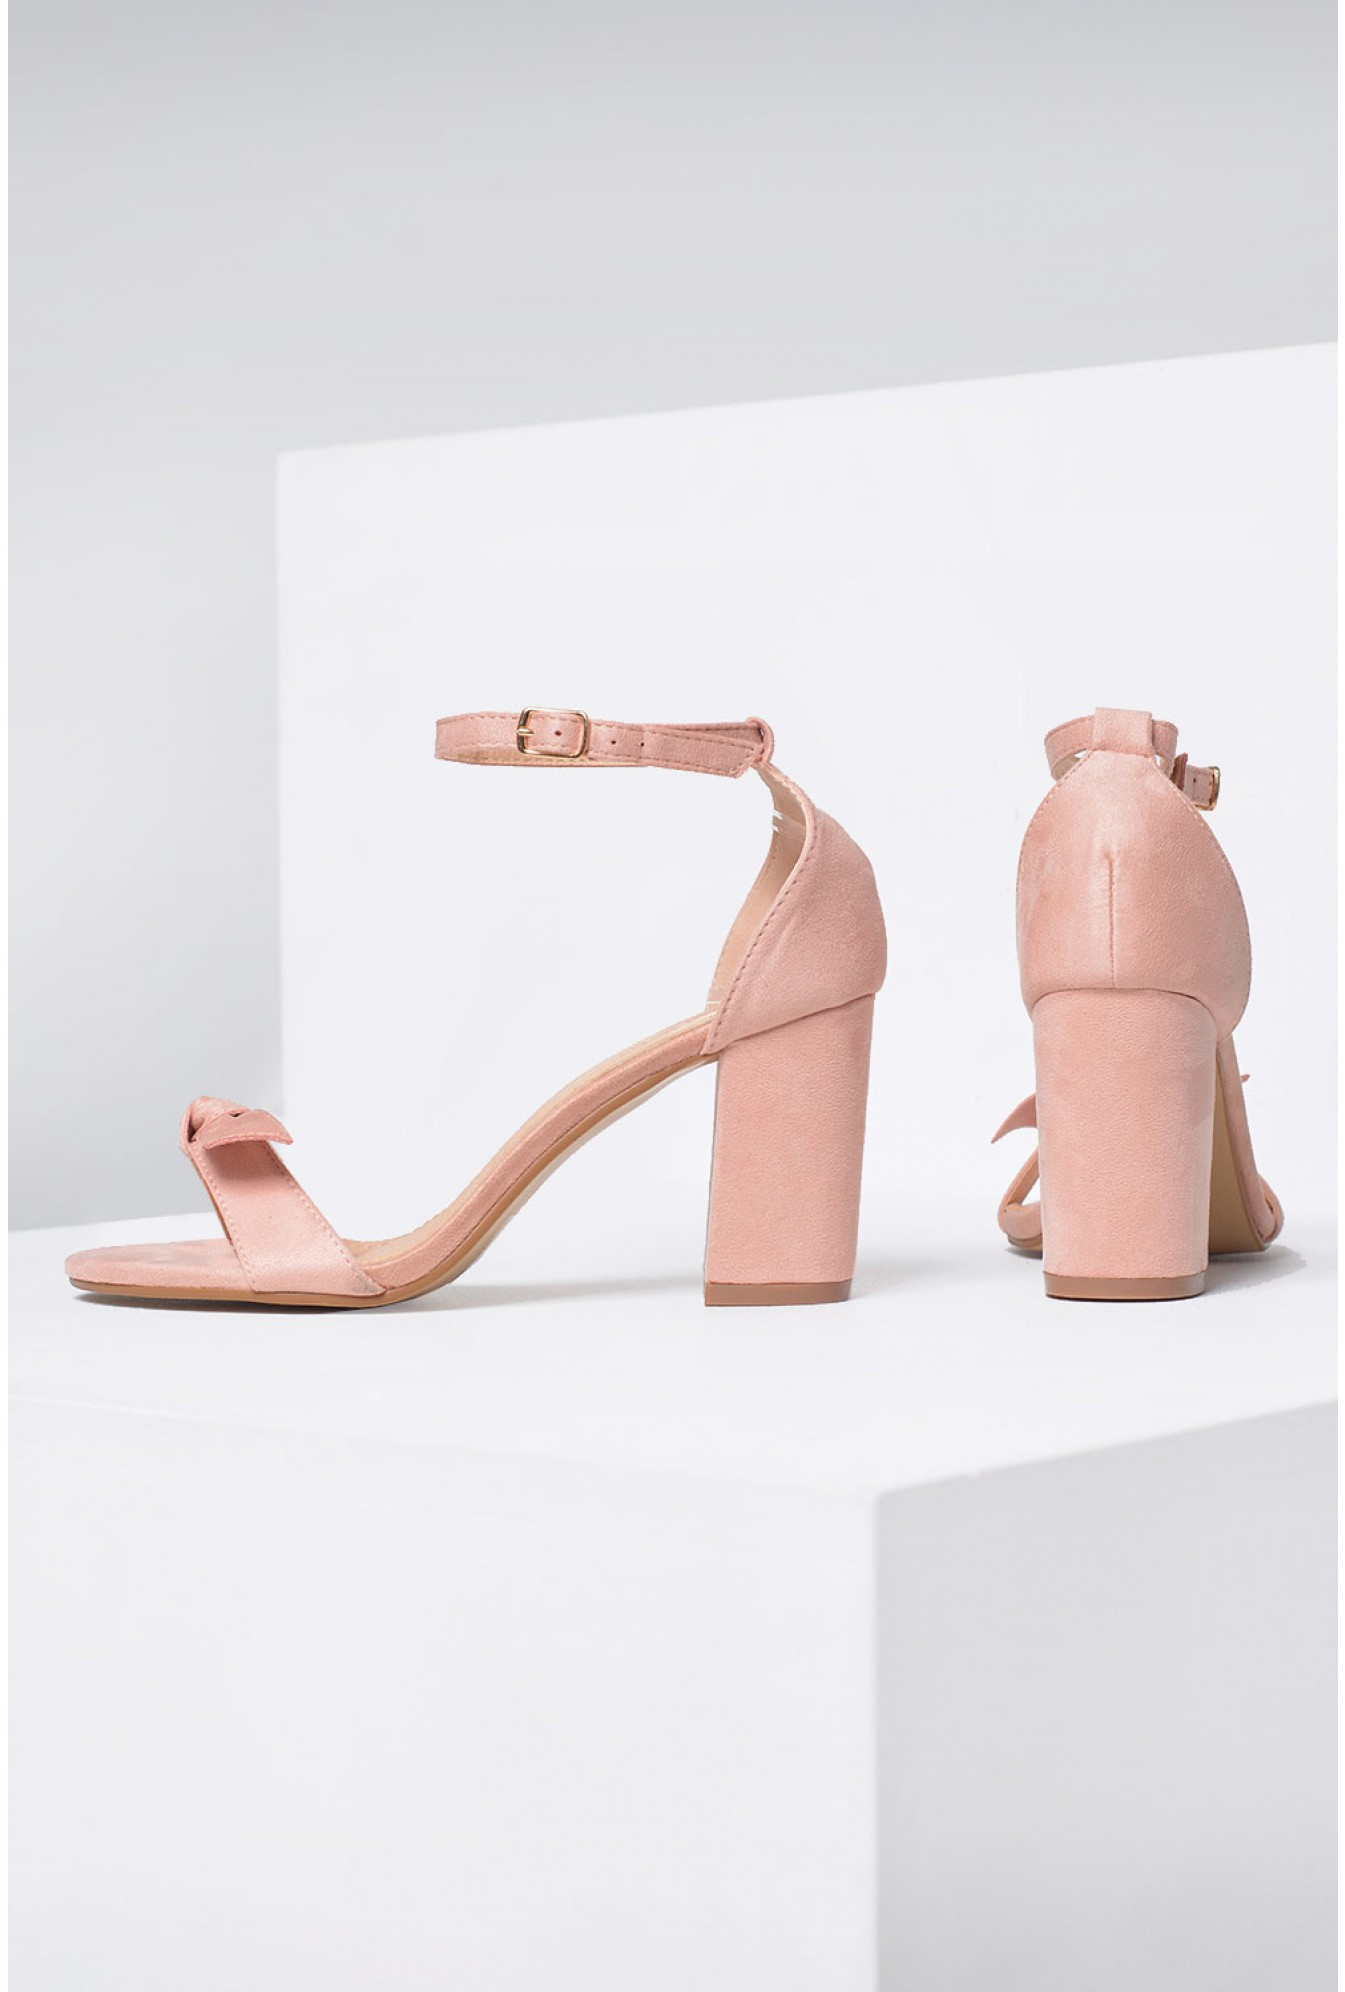 7eb4c6b988 No Doubt Emma Bow Block Heel Sandals in Blush | iCLOTHING